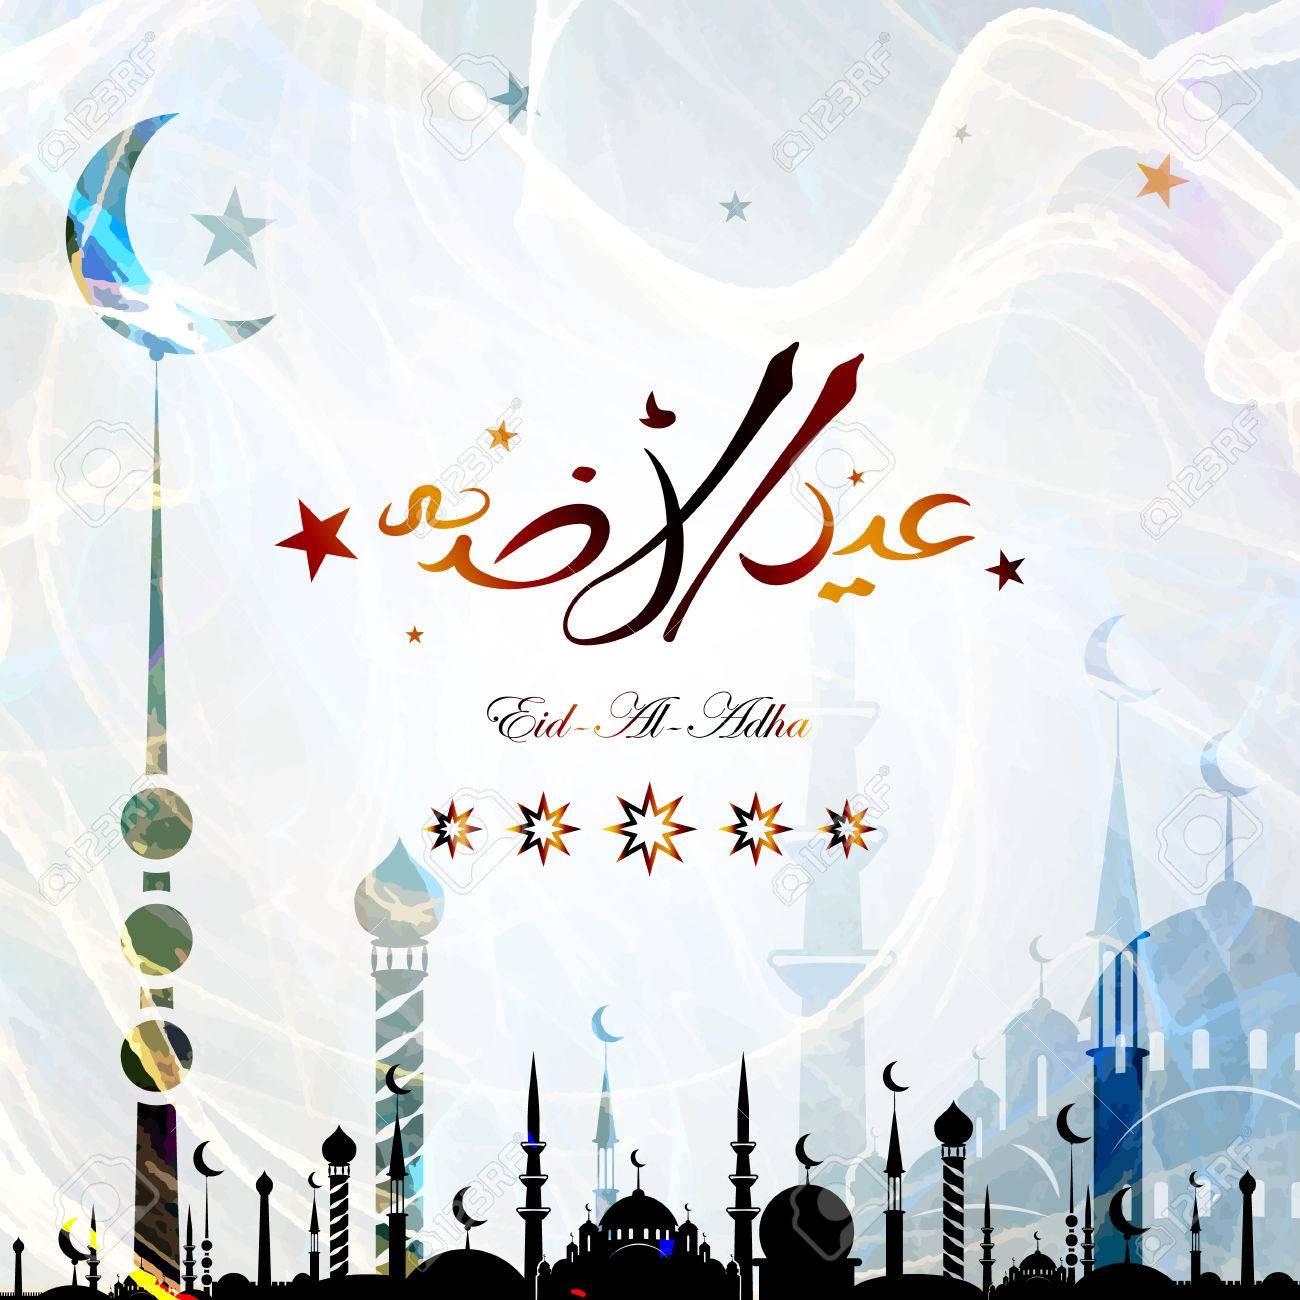 Eid Al Adha Greeting Cards Religious Themed Background Retro